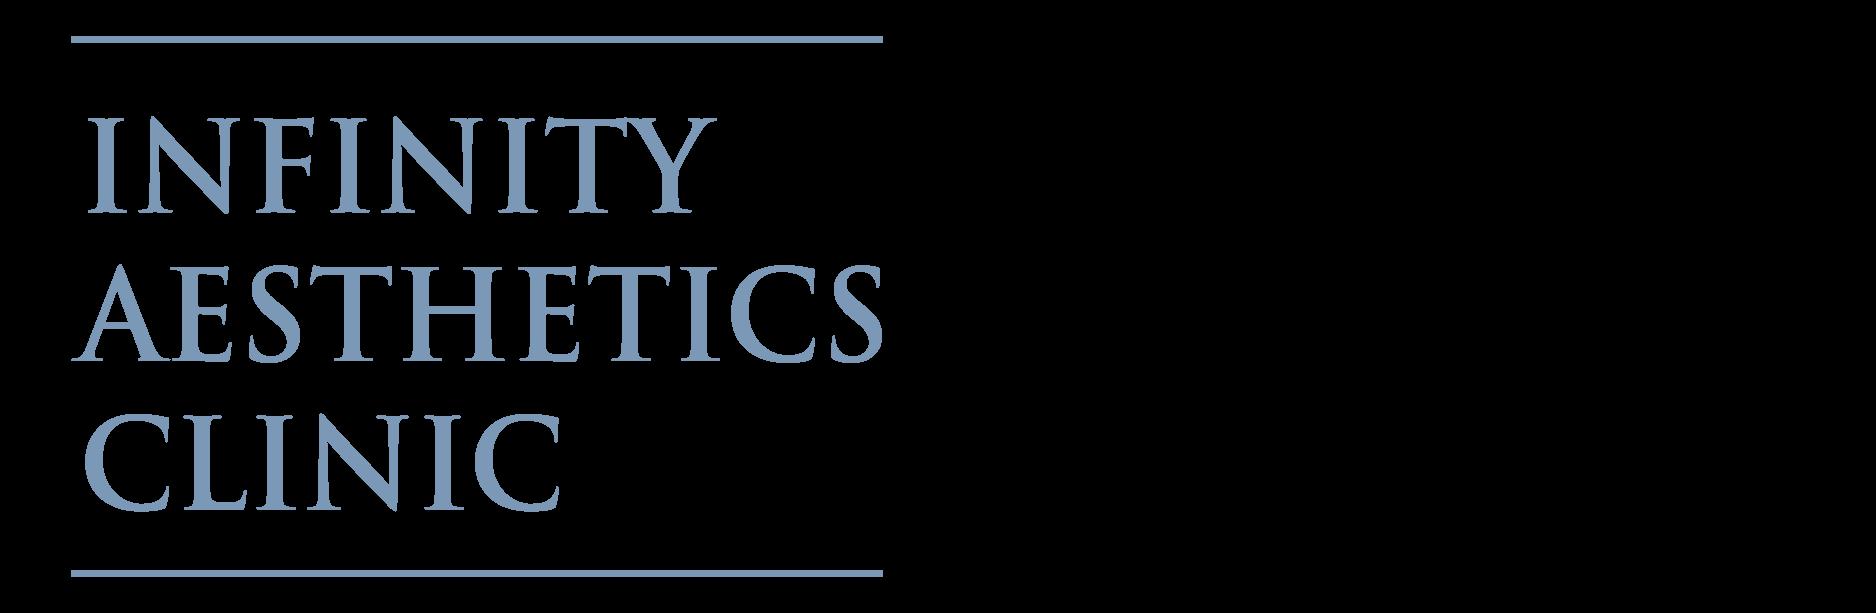 Infinity Aesthetics Clinic Singapore